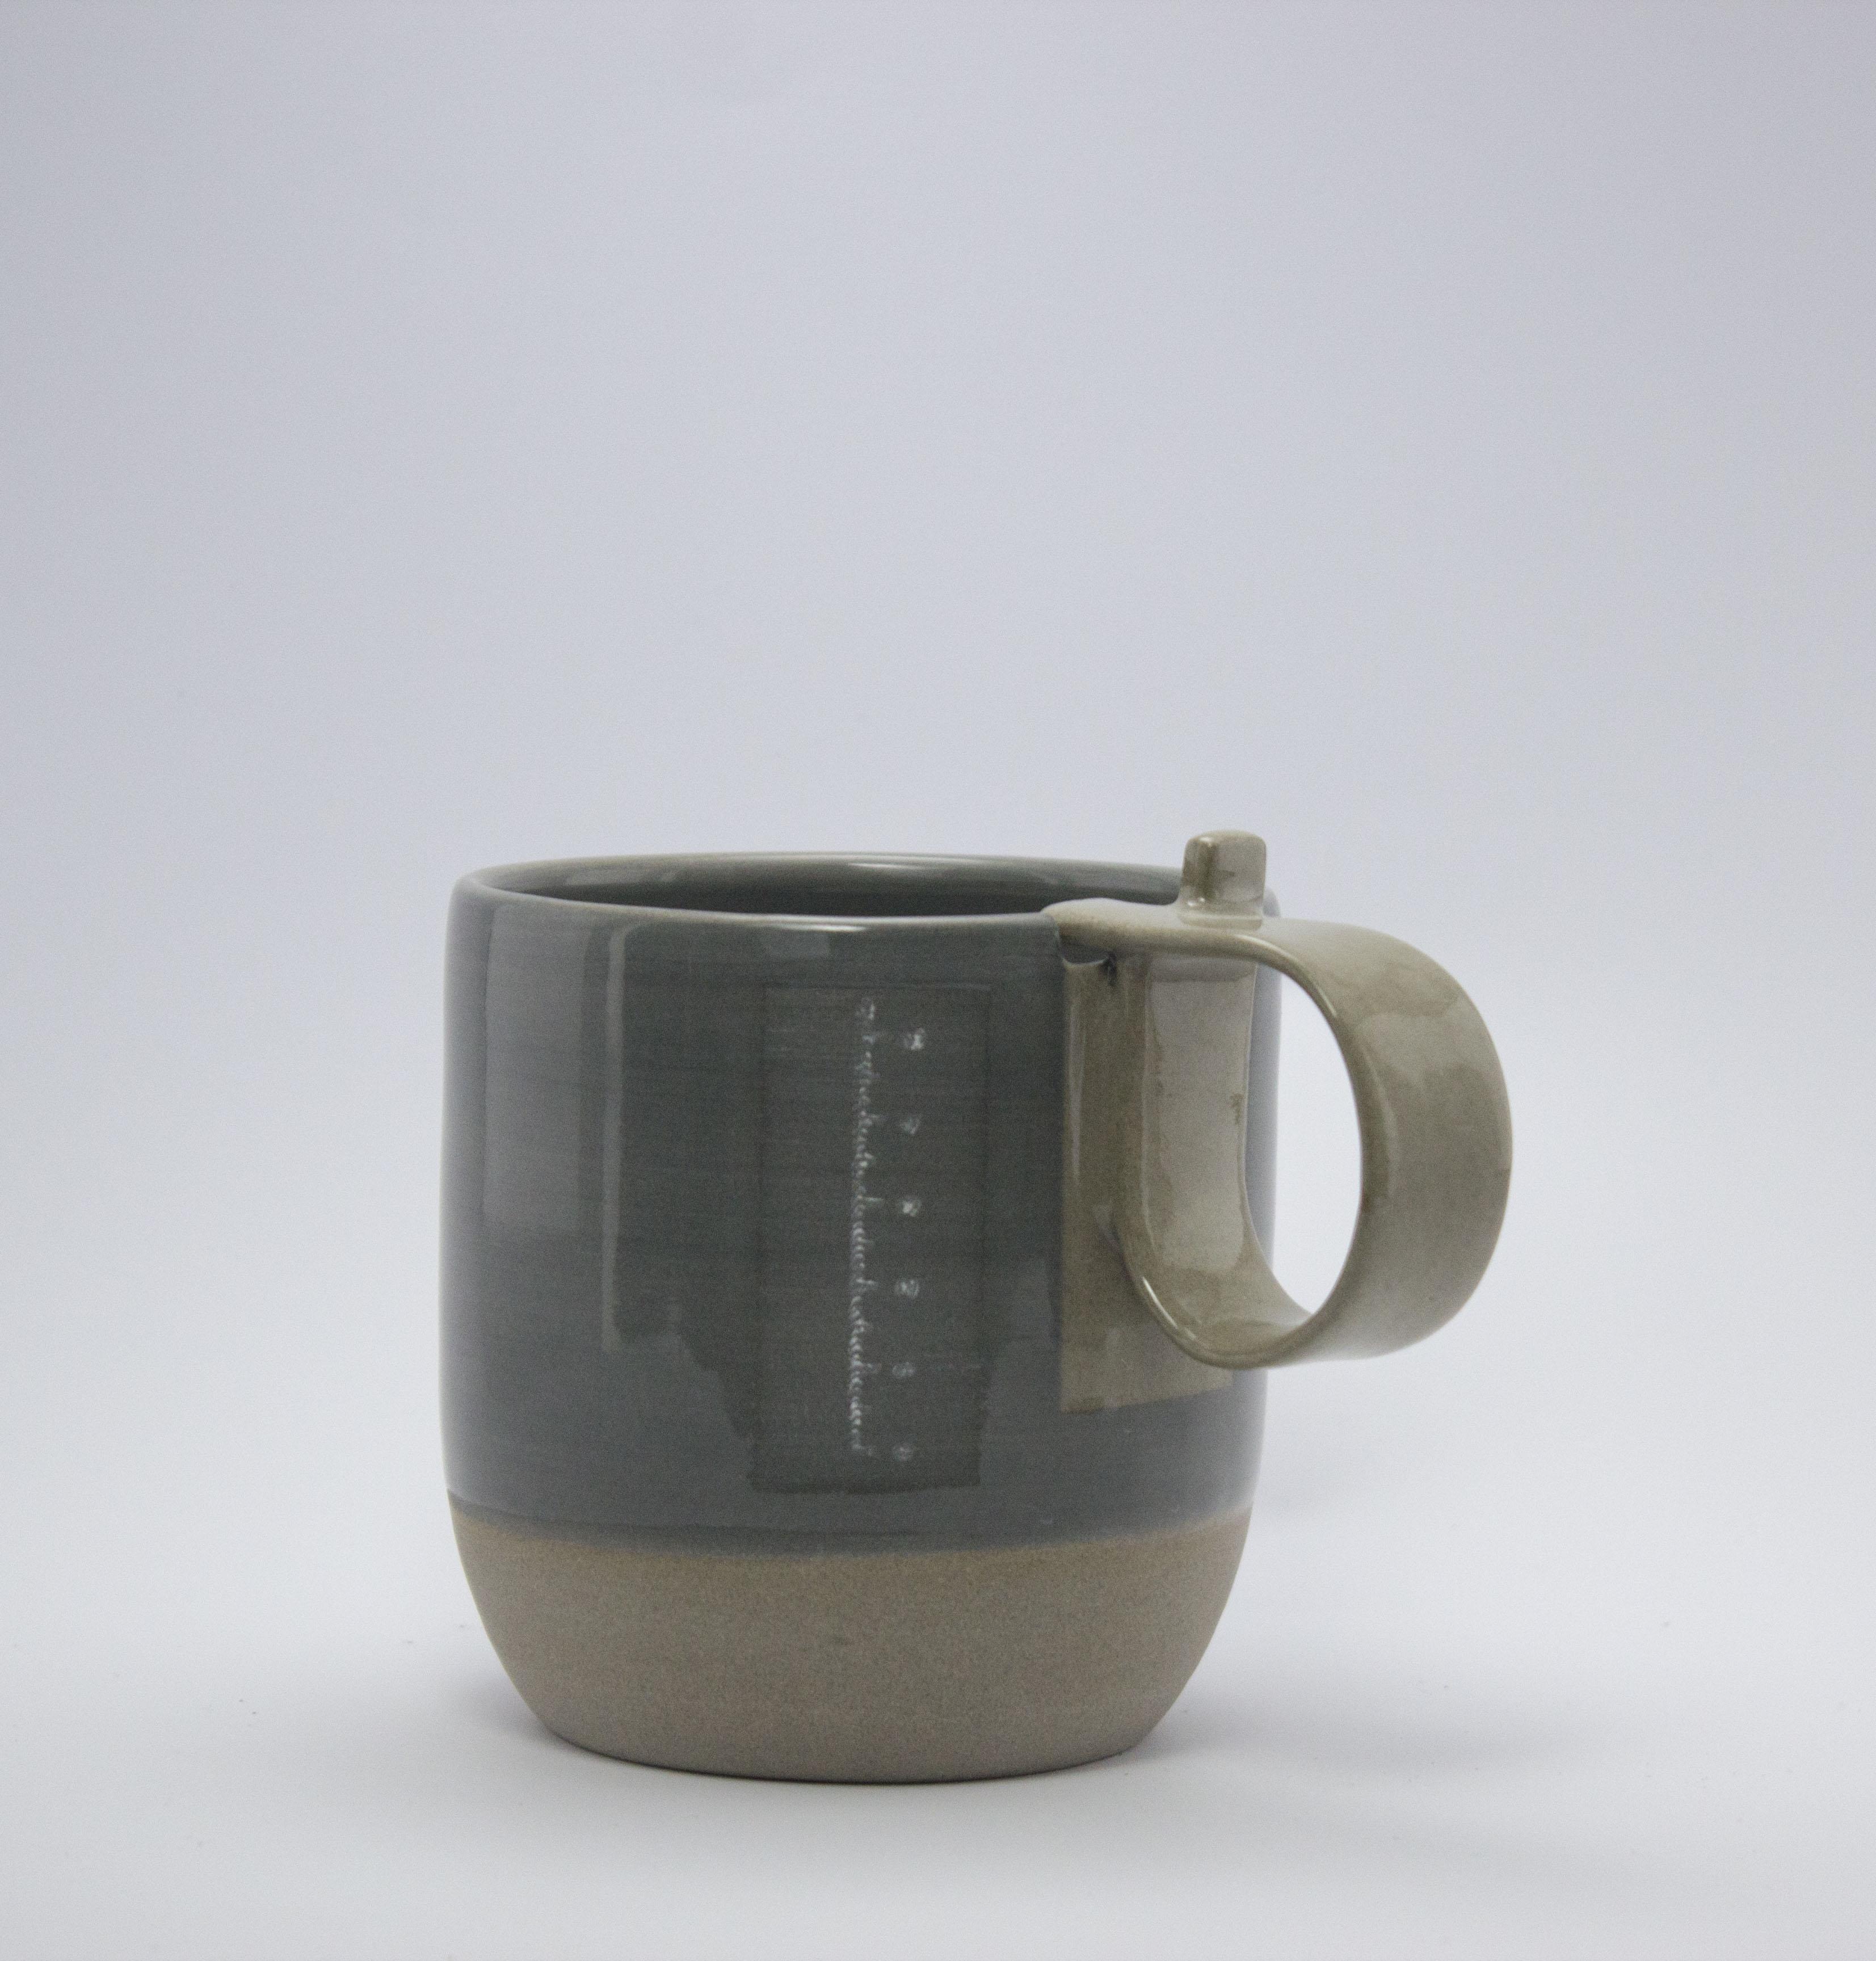 tasse grise et gris mesure 300